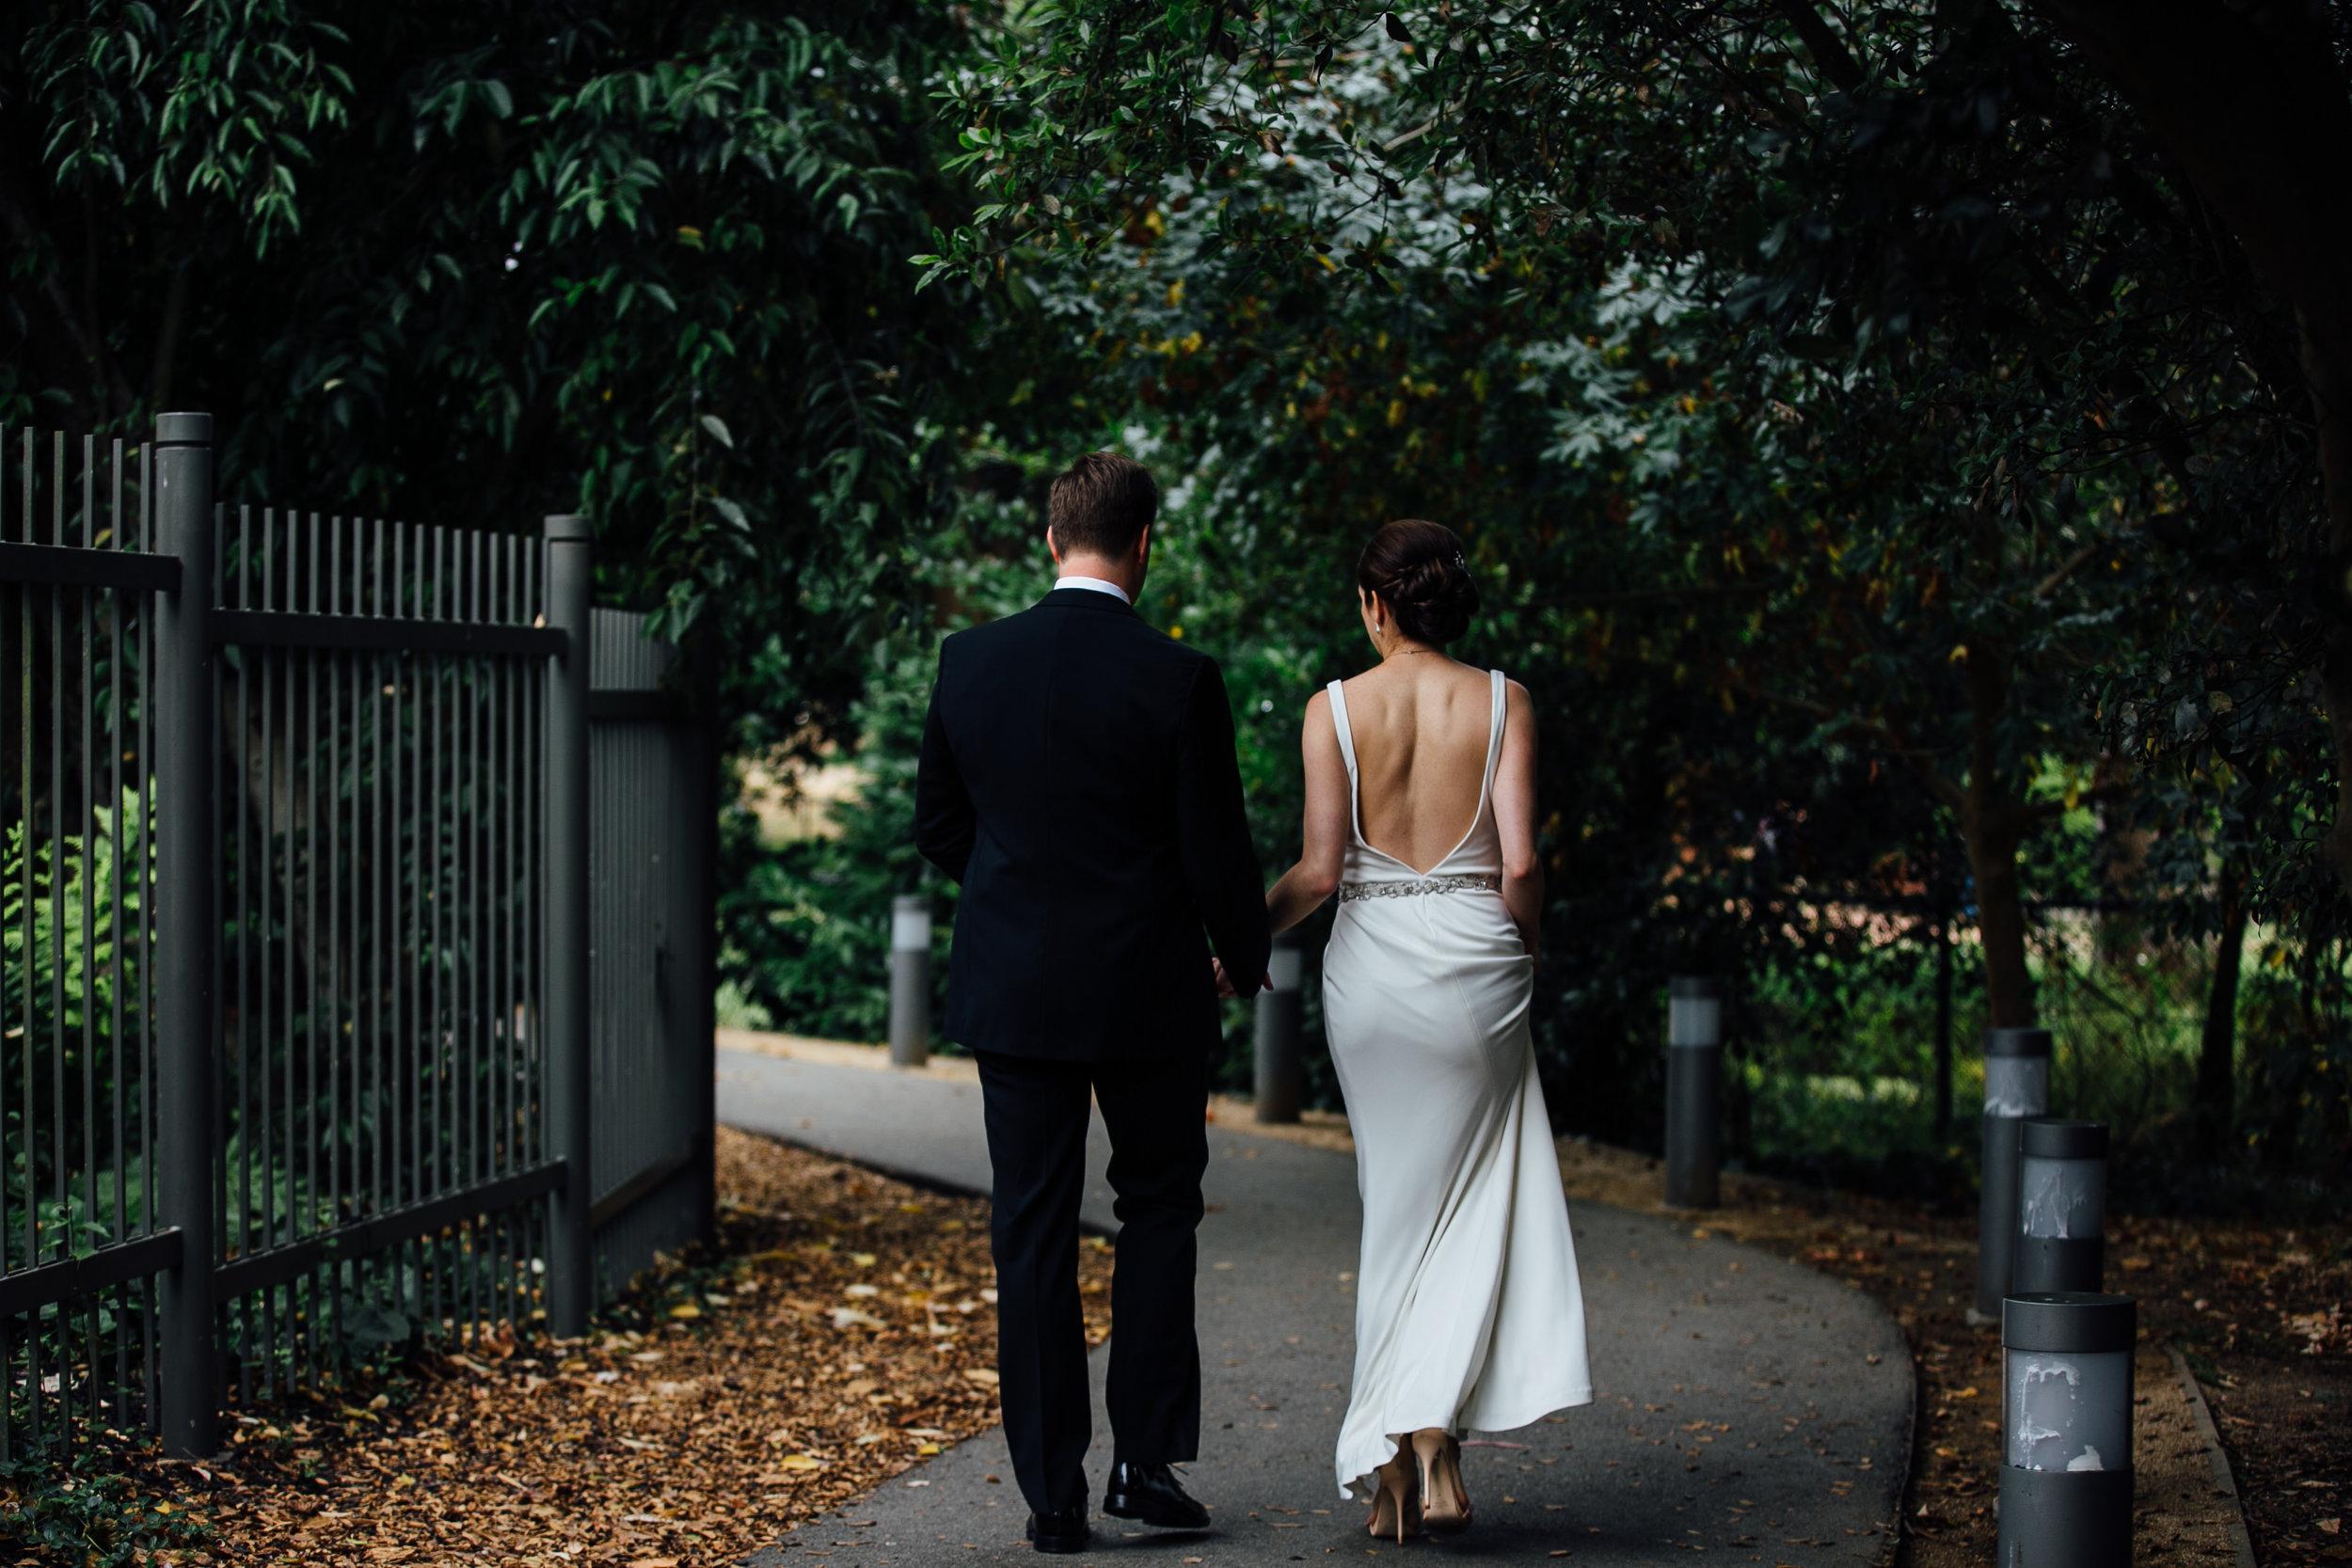 Wedding_KathleenMichael_BG_Portraits-208.jpg